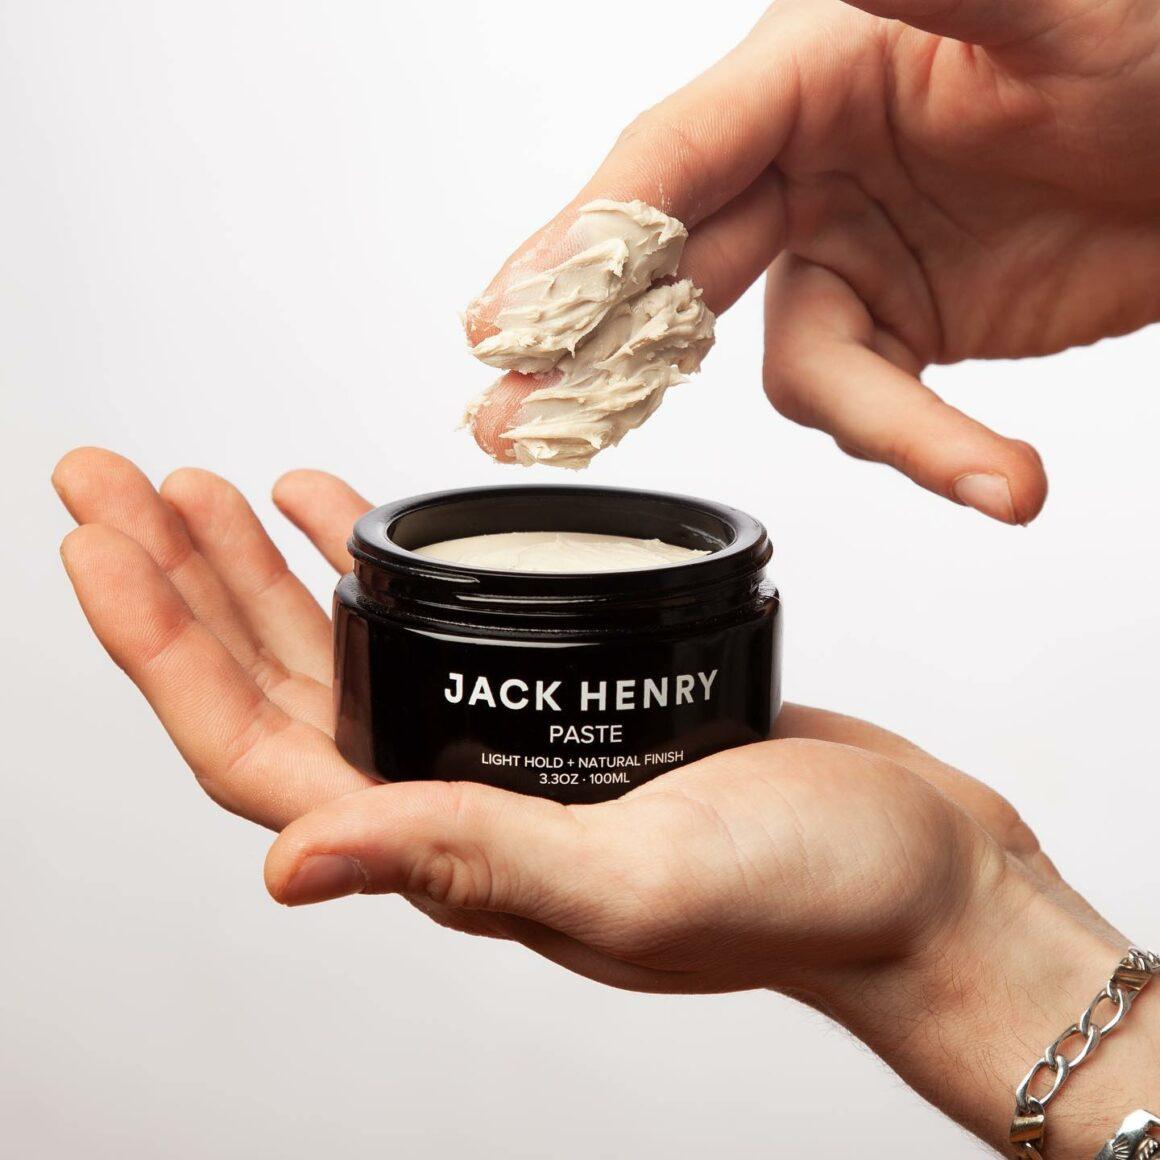 Natural and Organic Skincare Brands for Men - Jack Henry